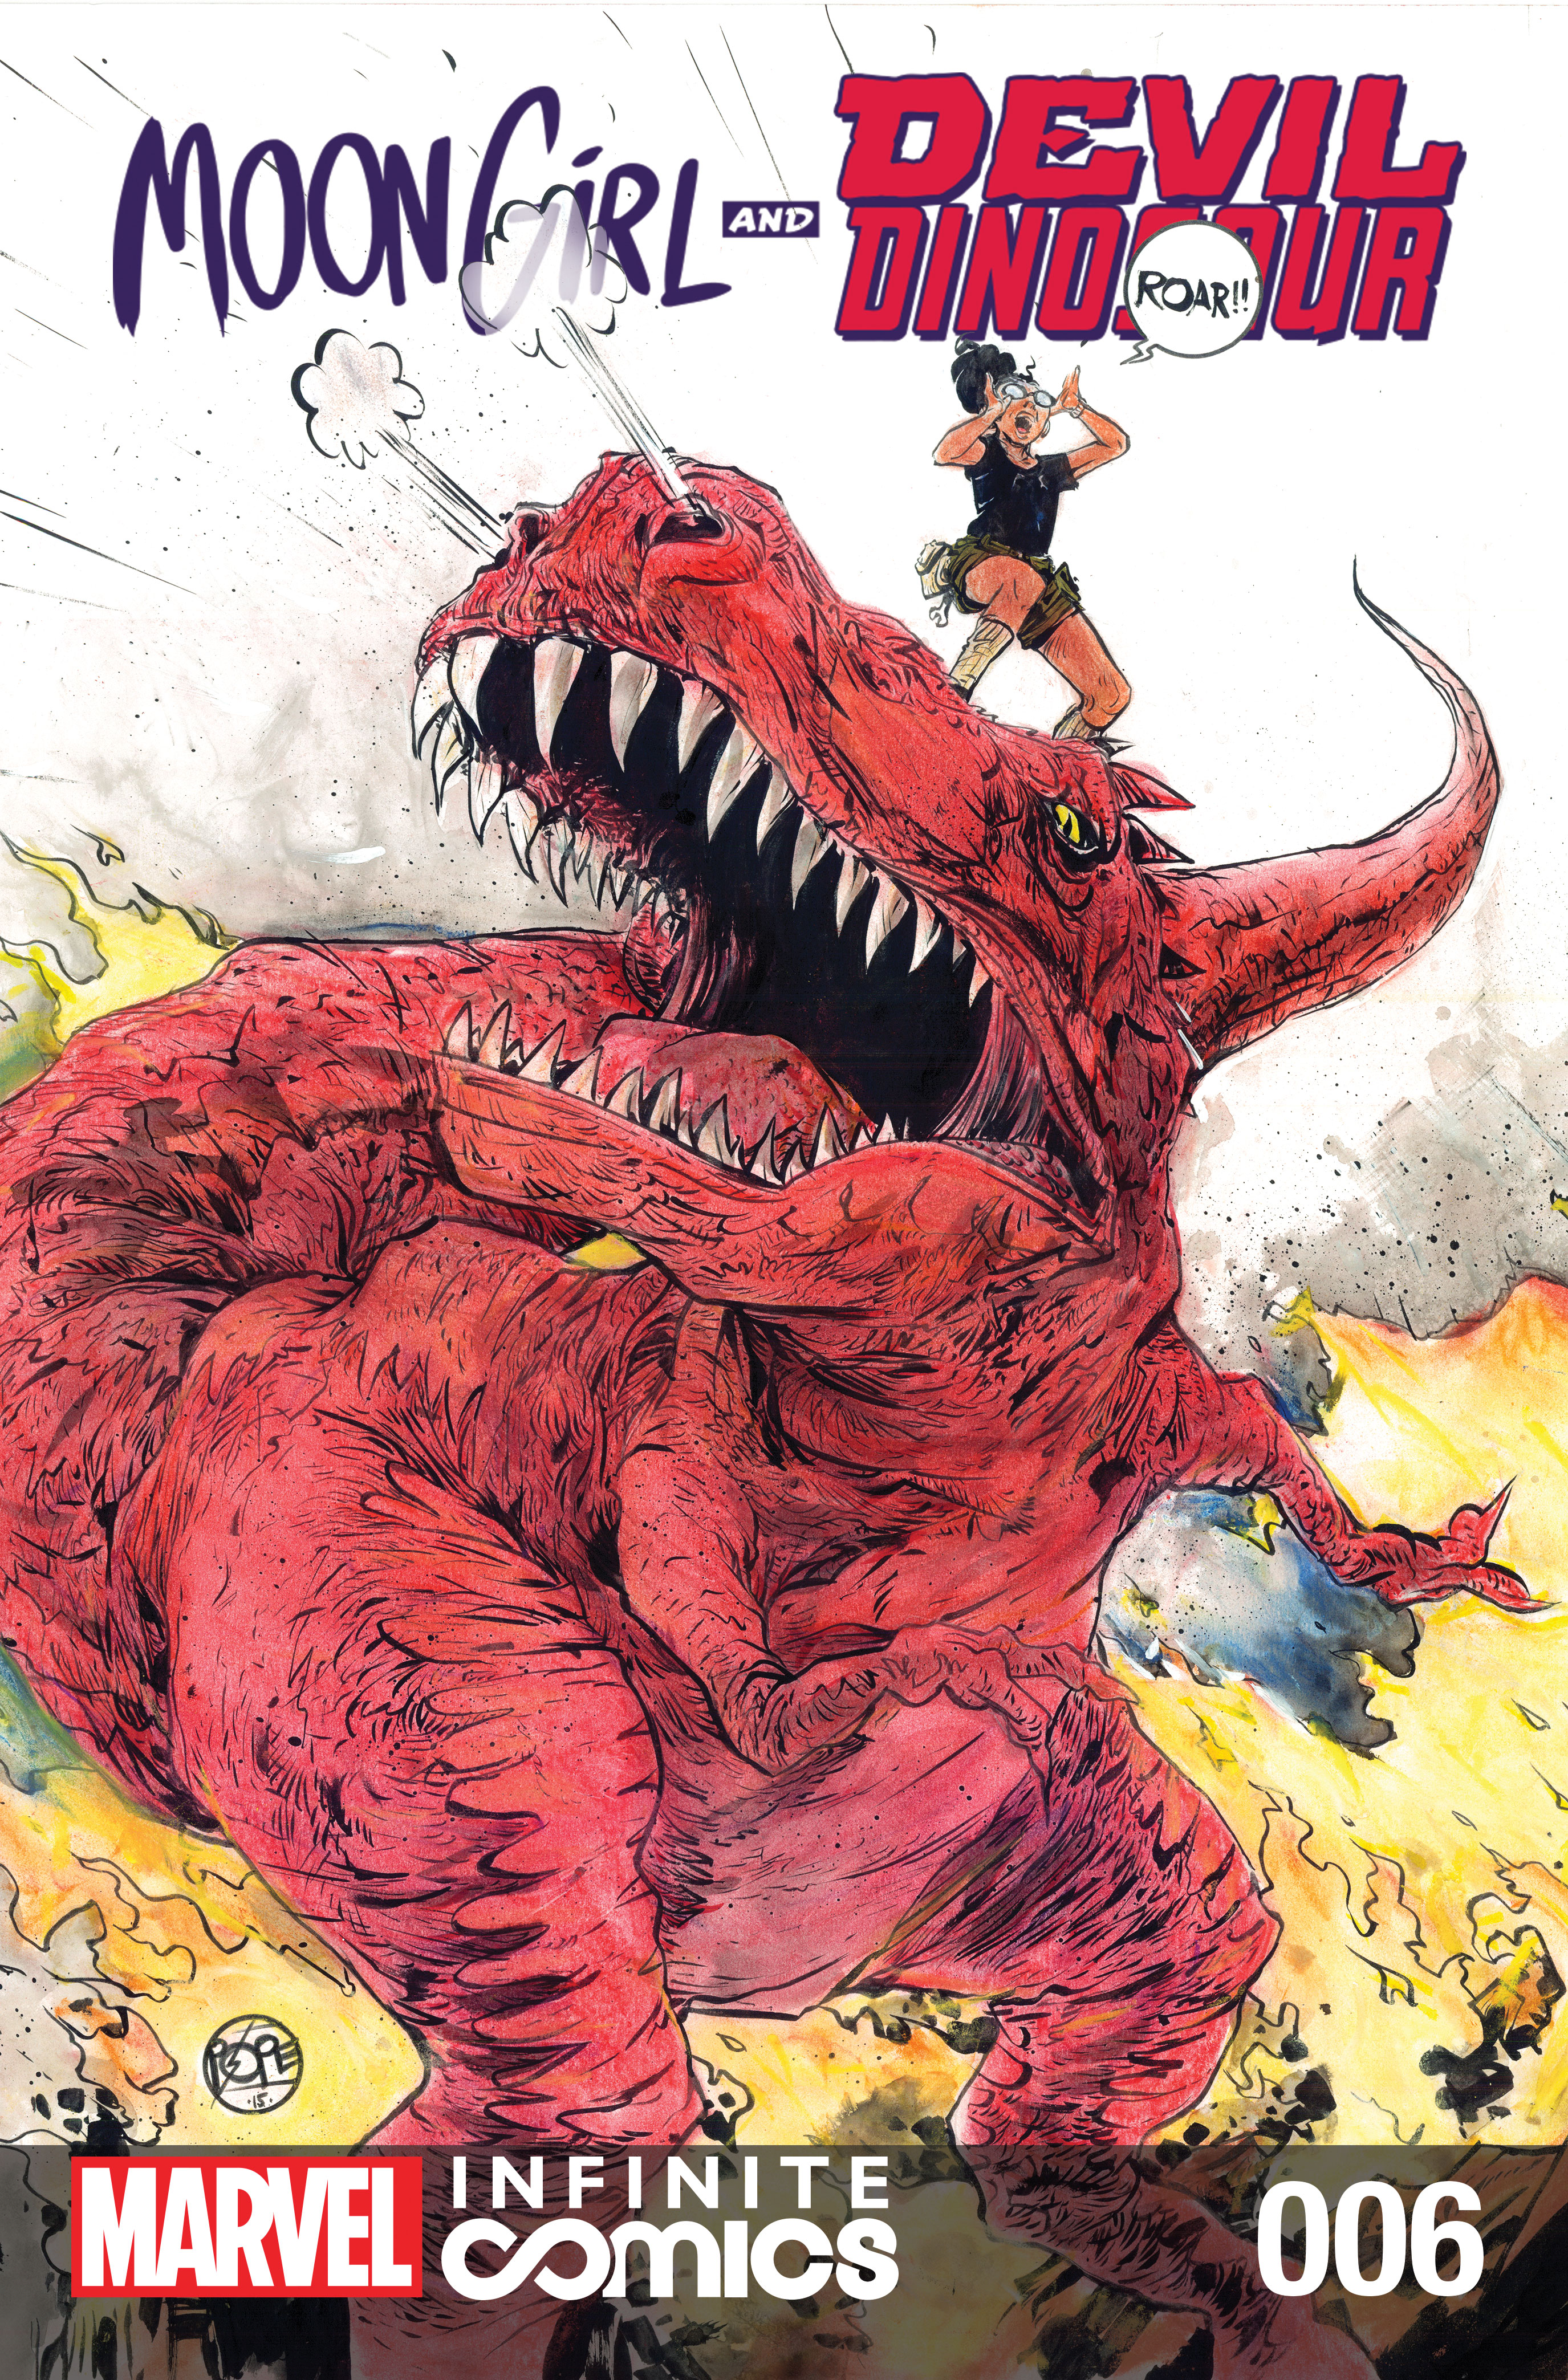 Moon Girl and Devil Dinosaur Infinite Comic (2019) #6